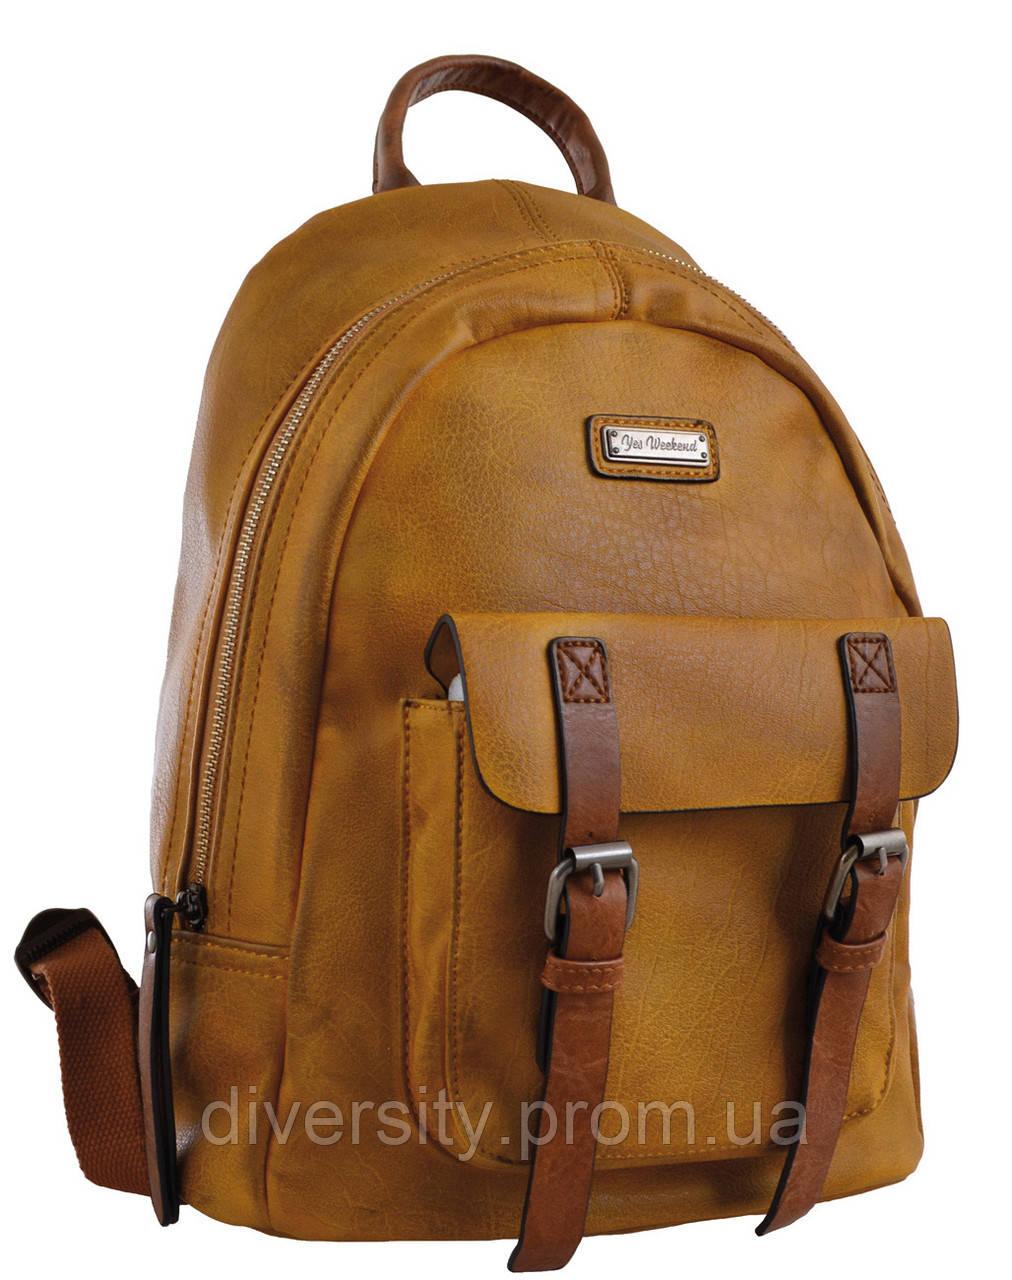 Женский рюкзак YES YW-18, горчичный